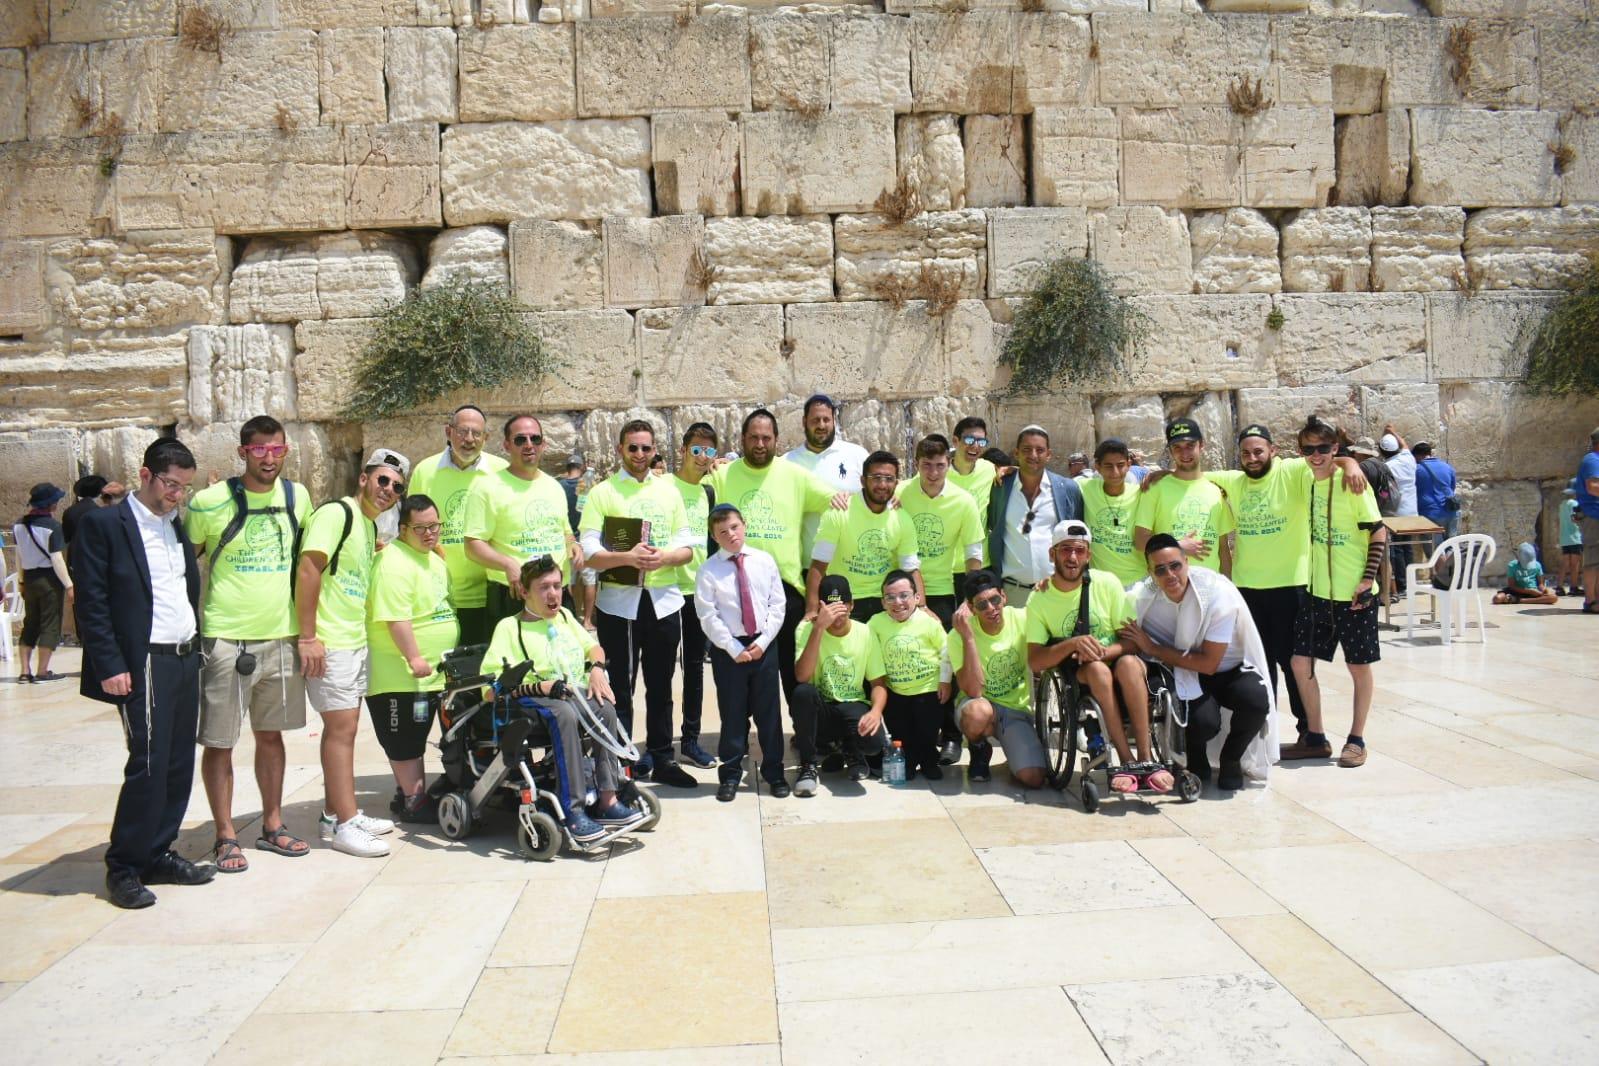 The Hatzolah team at the Western Wall